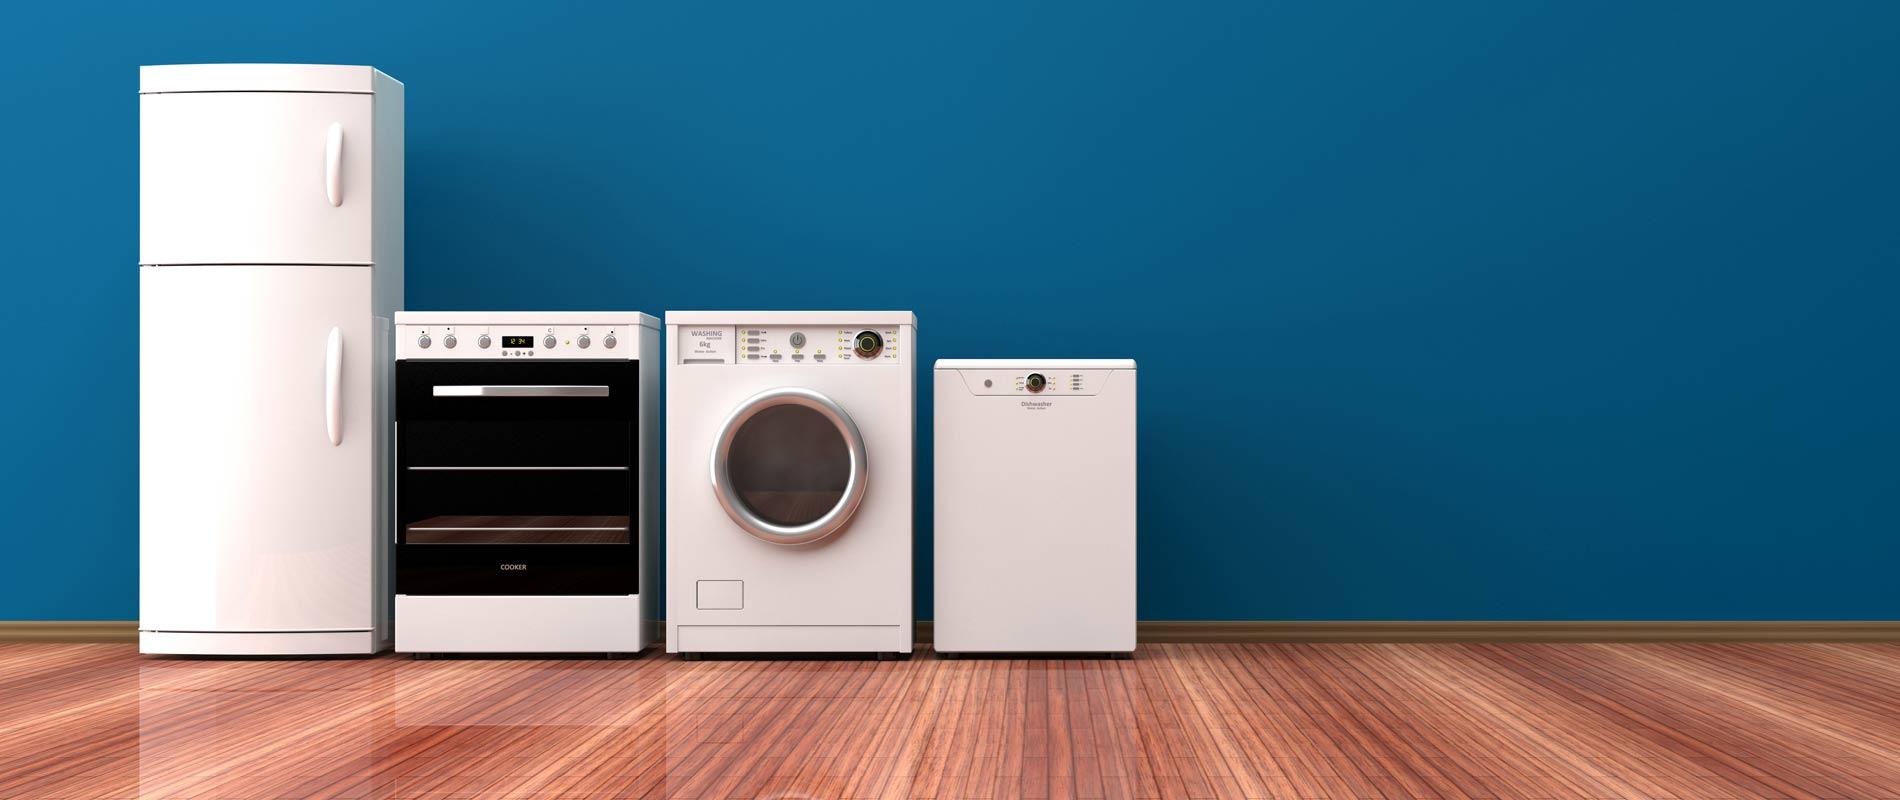 Appliance Repair In Santa Fe Nm Refrigerator Whirlpool Washing Machine Parts Diagram Besides Duet Washer Most On Hand